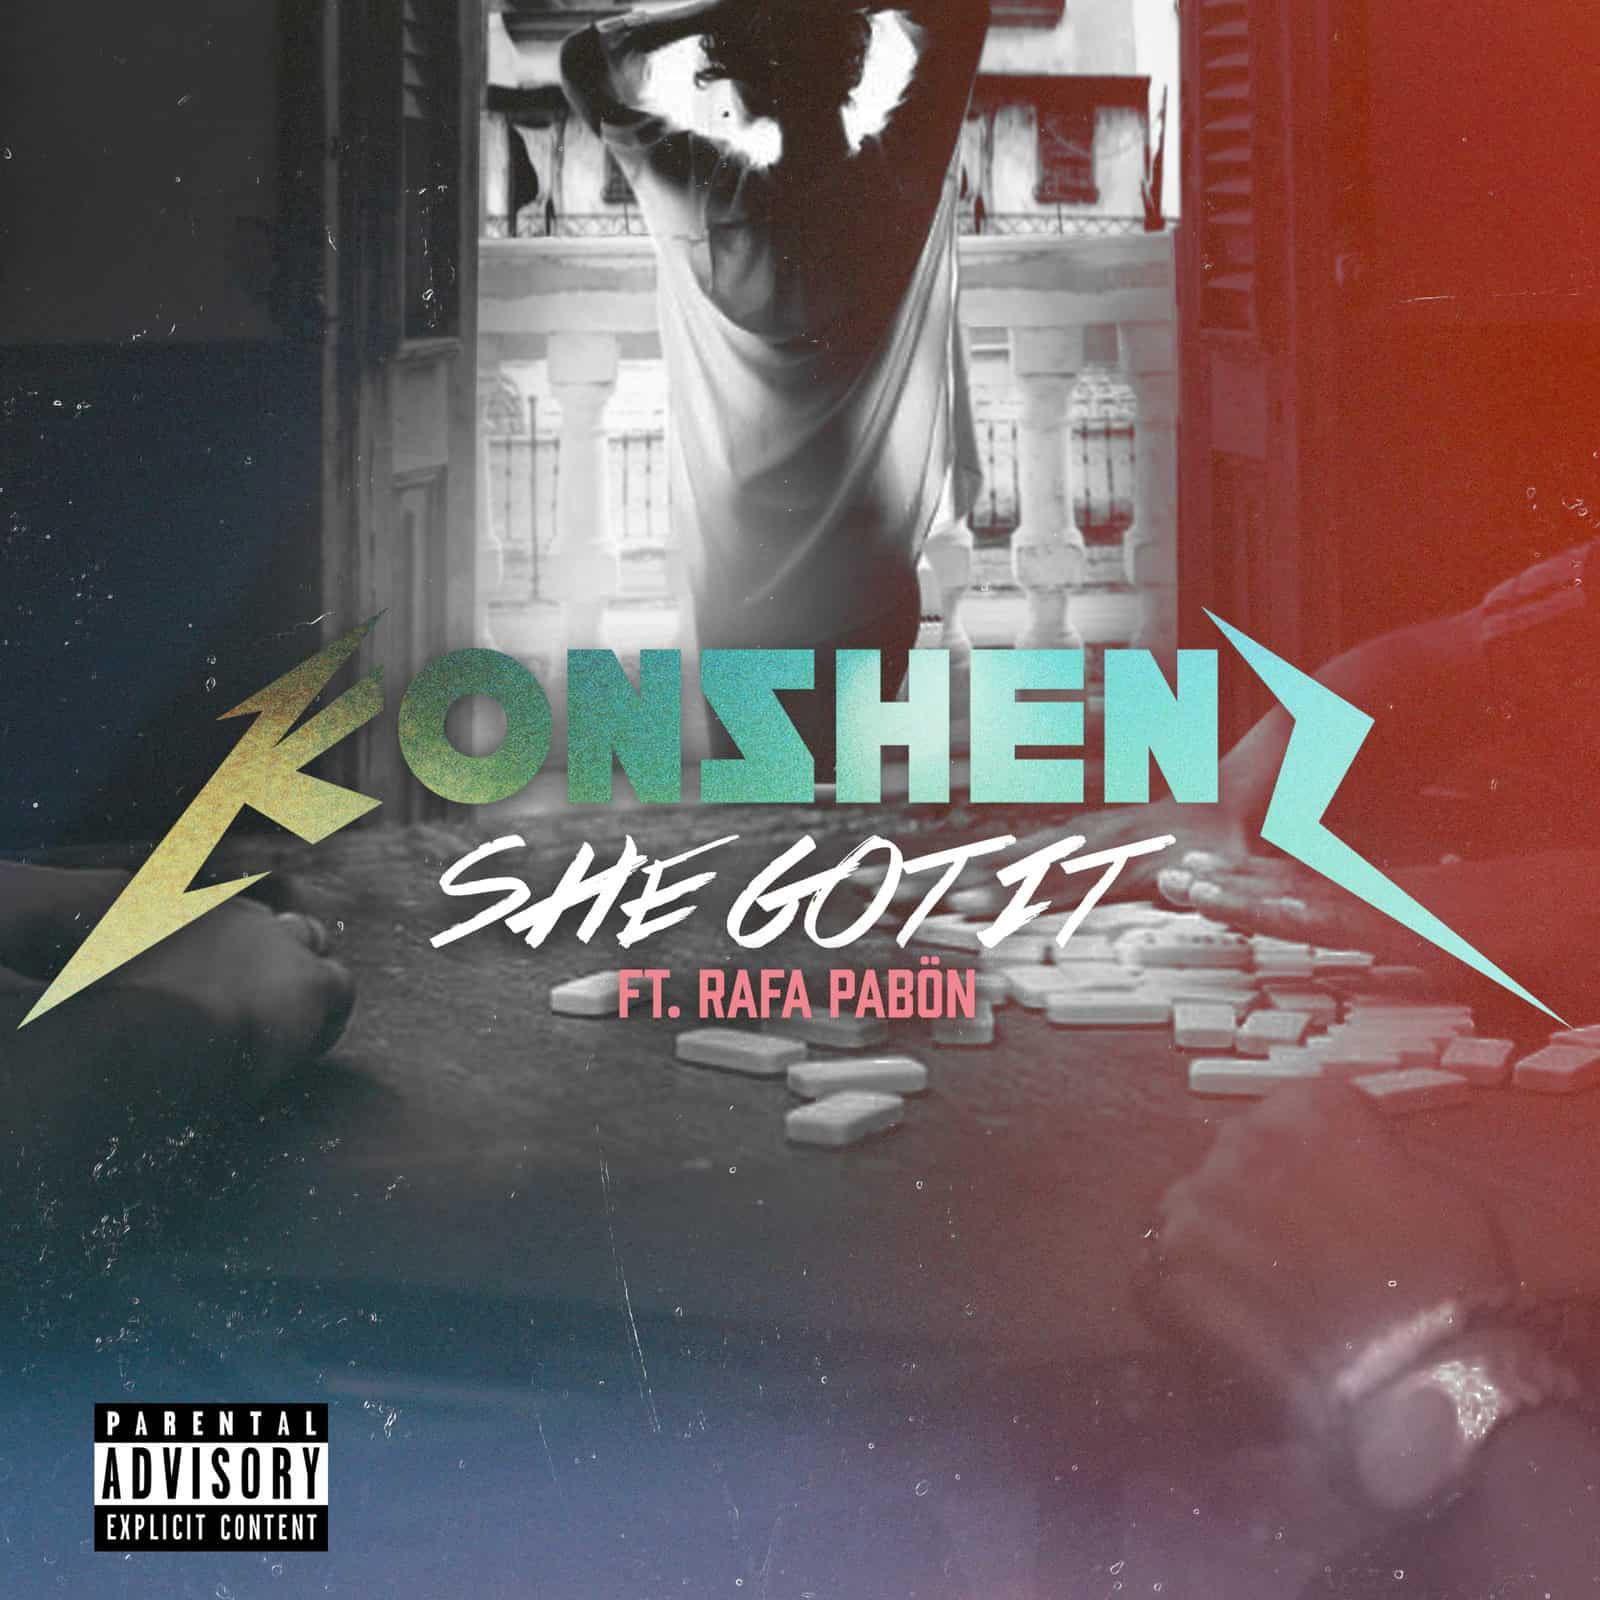 Konshens - She Got It ft. Rafa Pabön